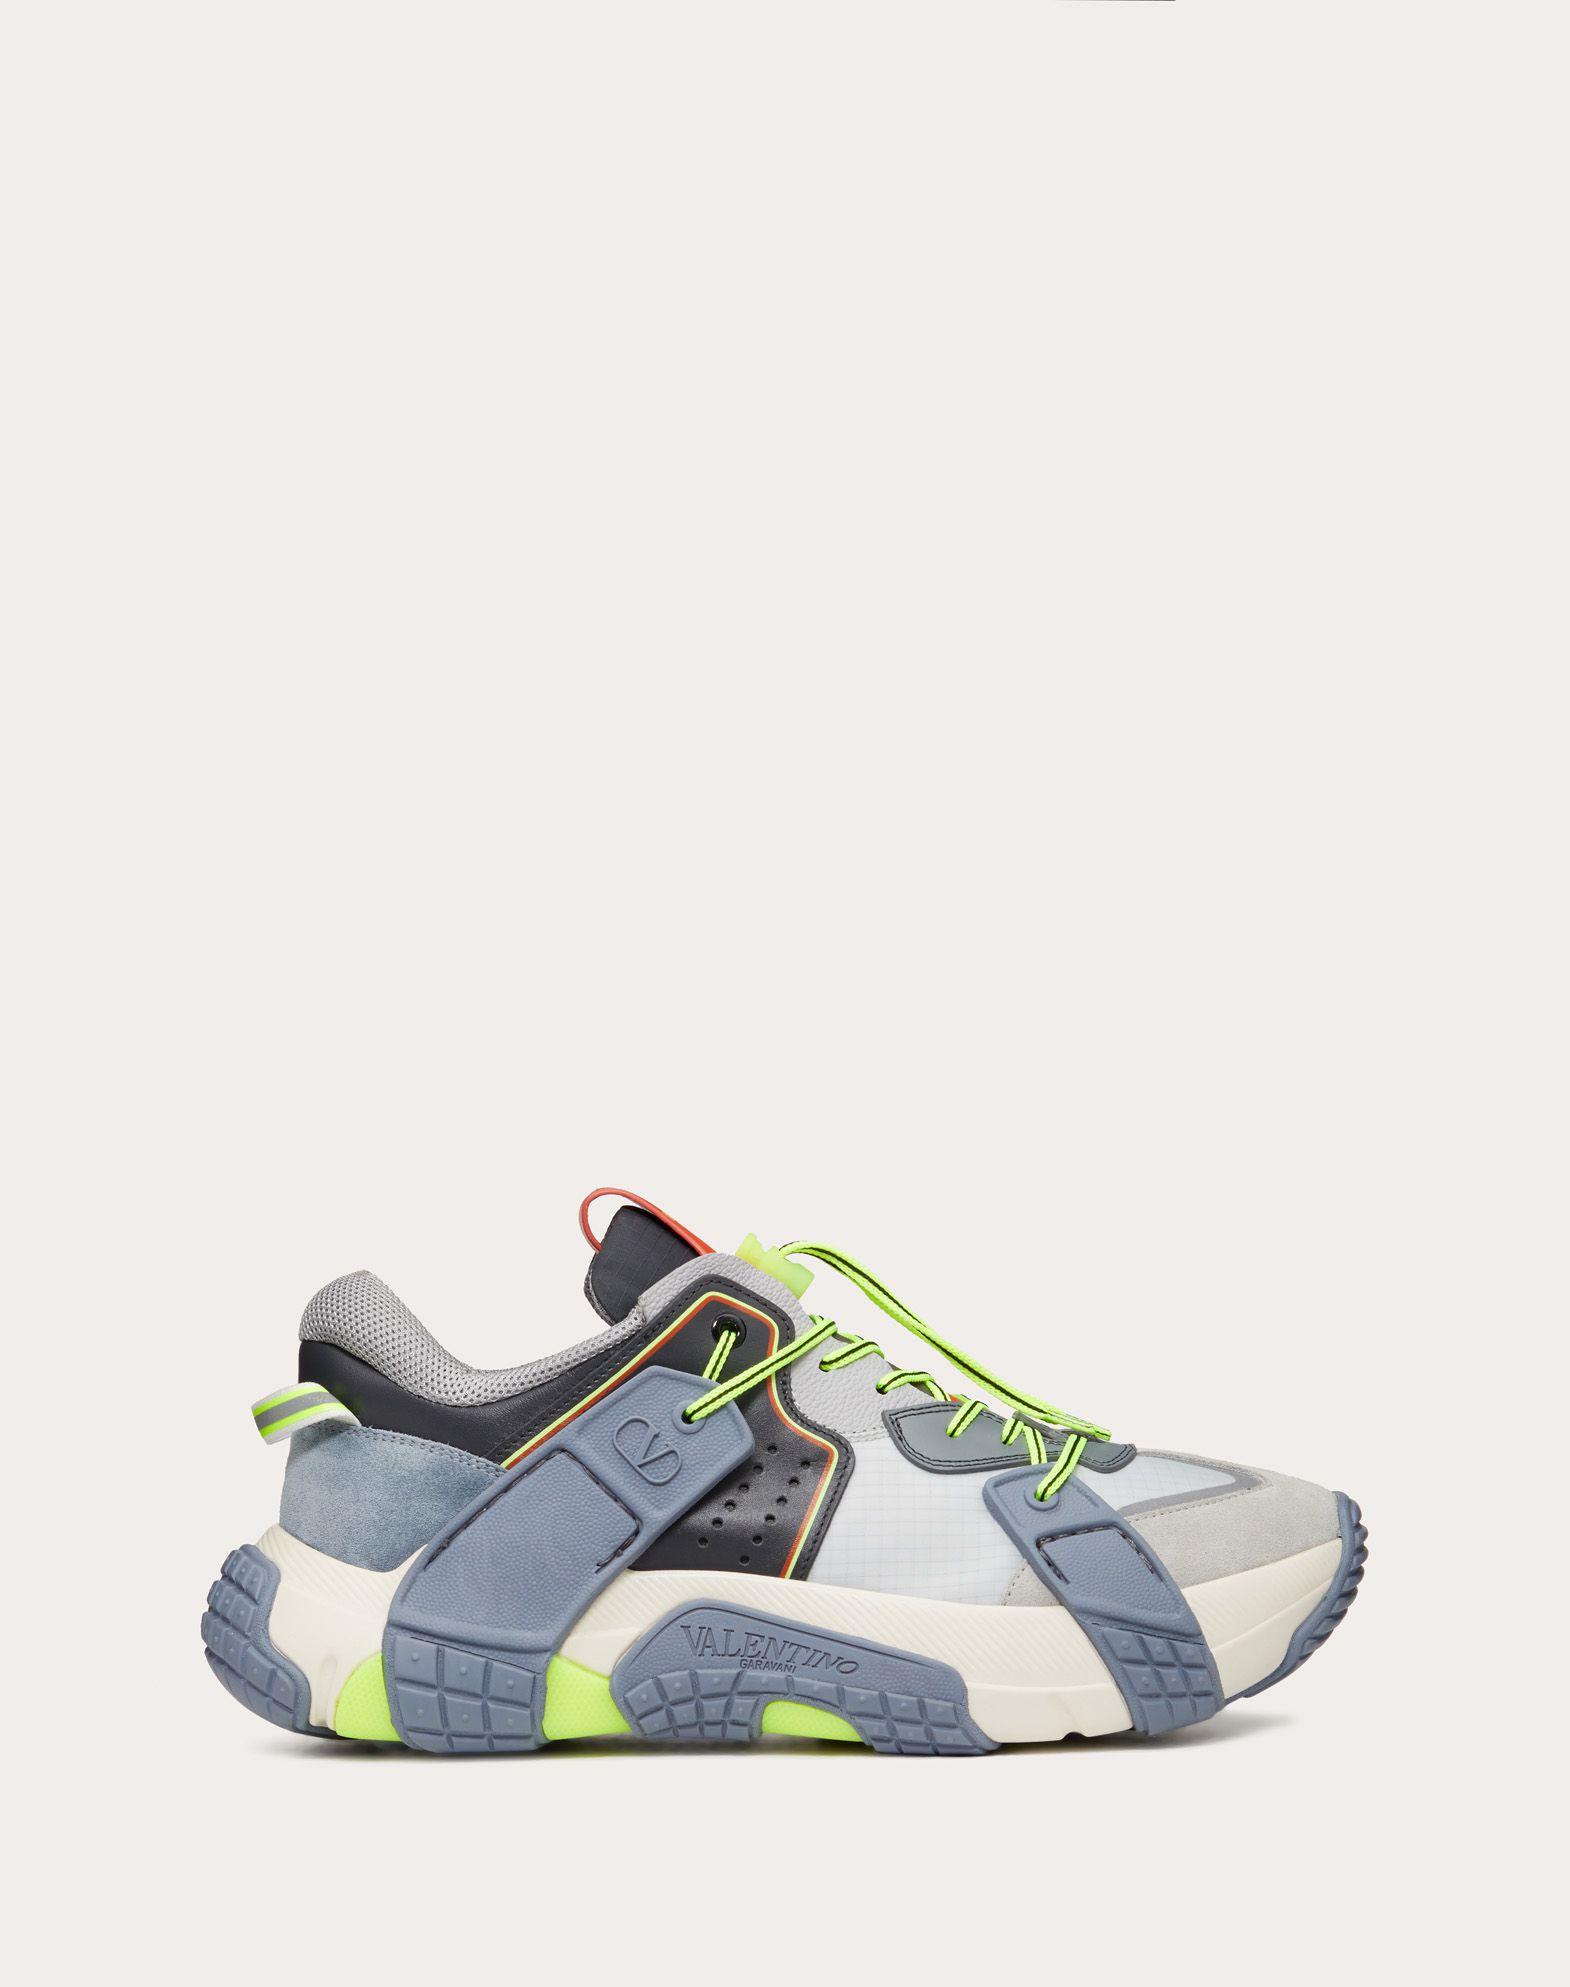 VLTN Wod Sneaker in Fabric, Calfskin and Suede